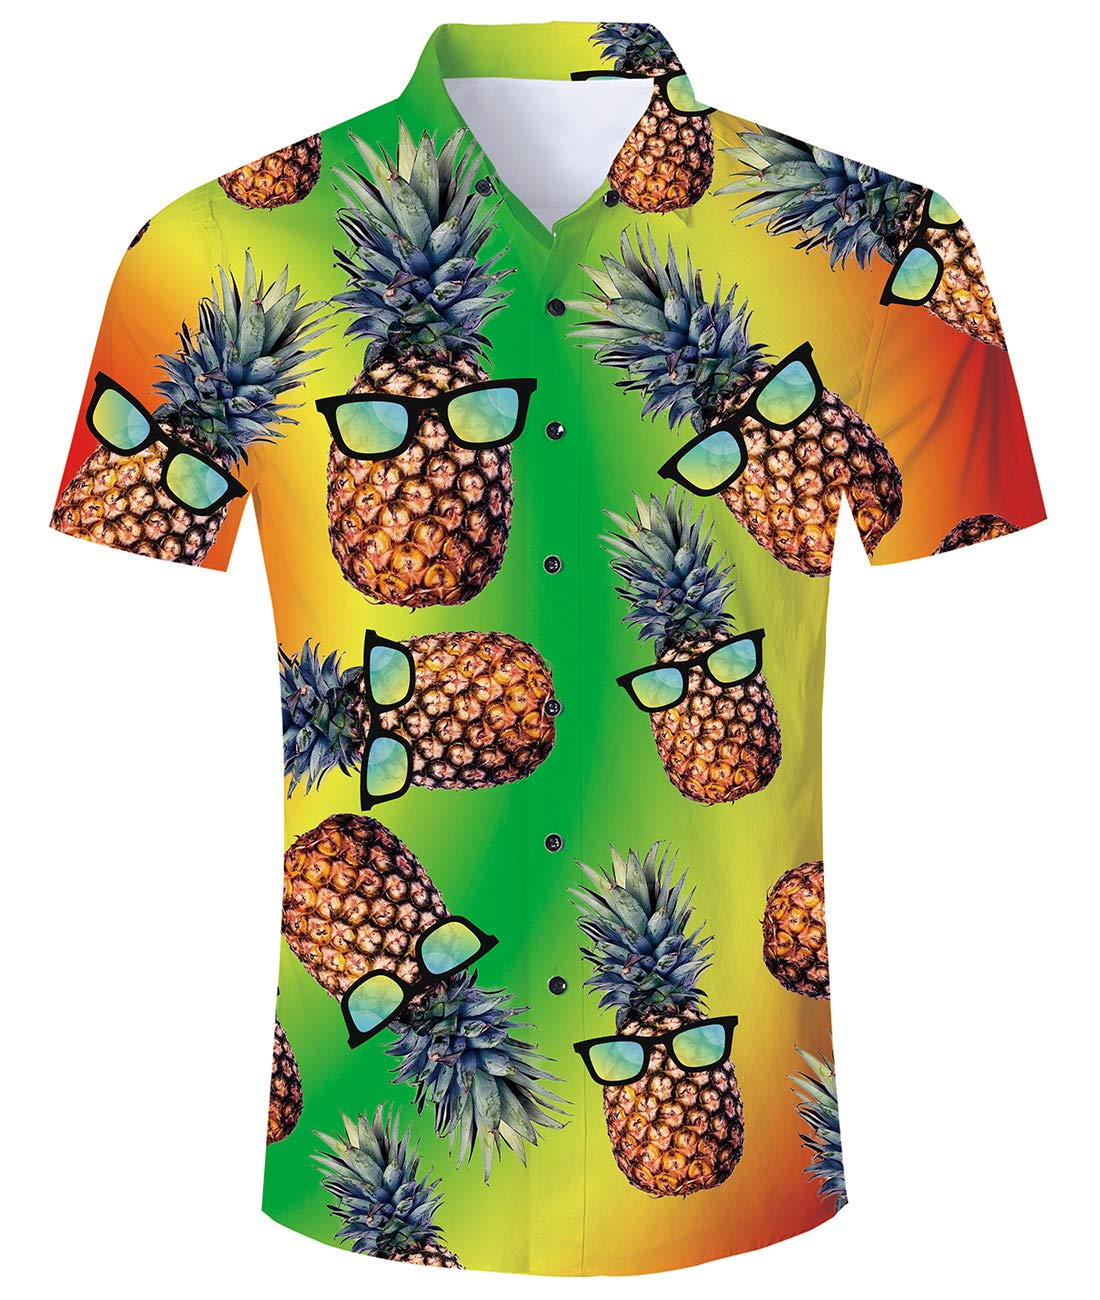 Goodstoworld 2020 Men's Button Down Shortsleeve Unique Hawaiian Shirts